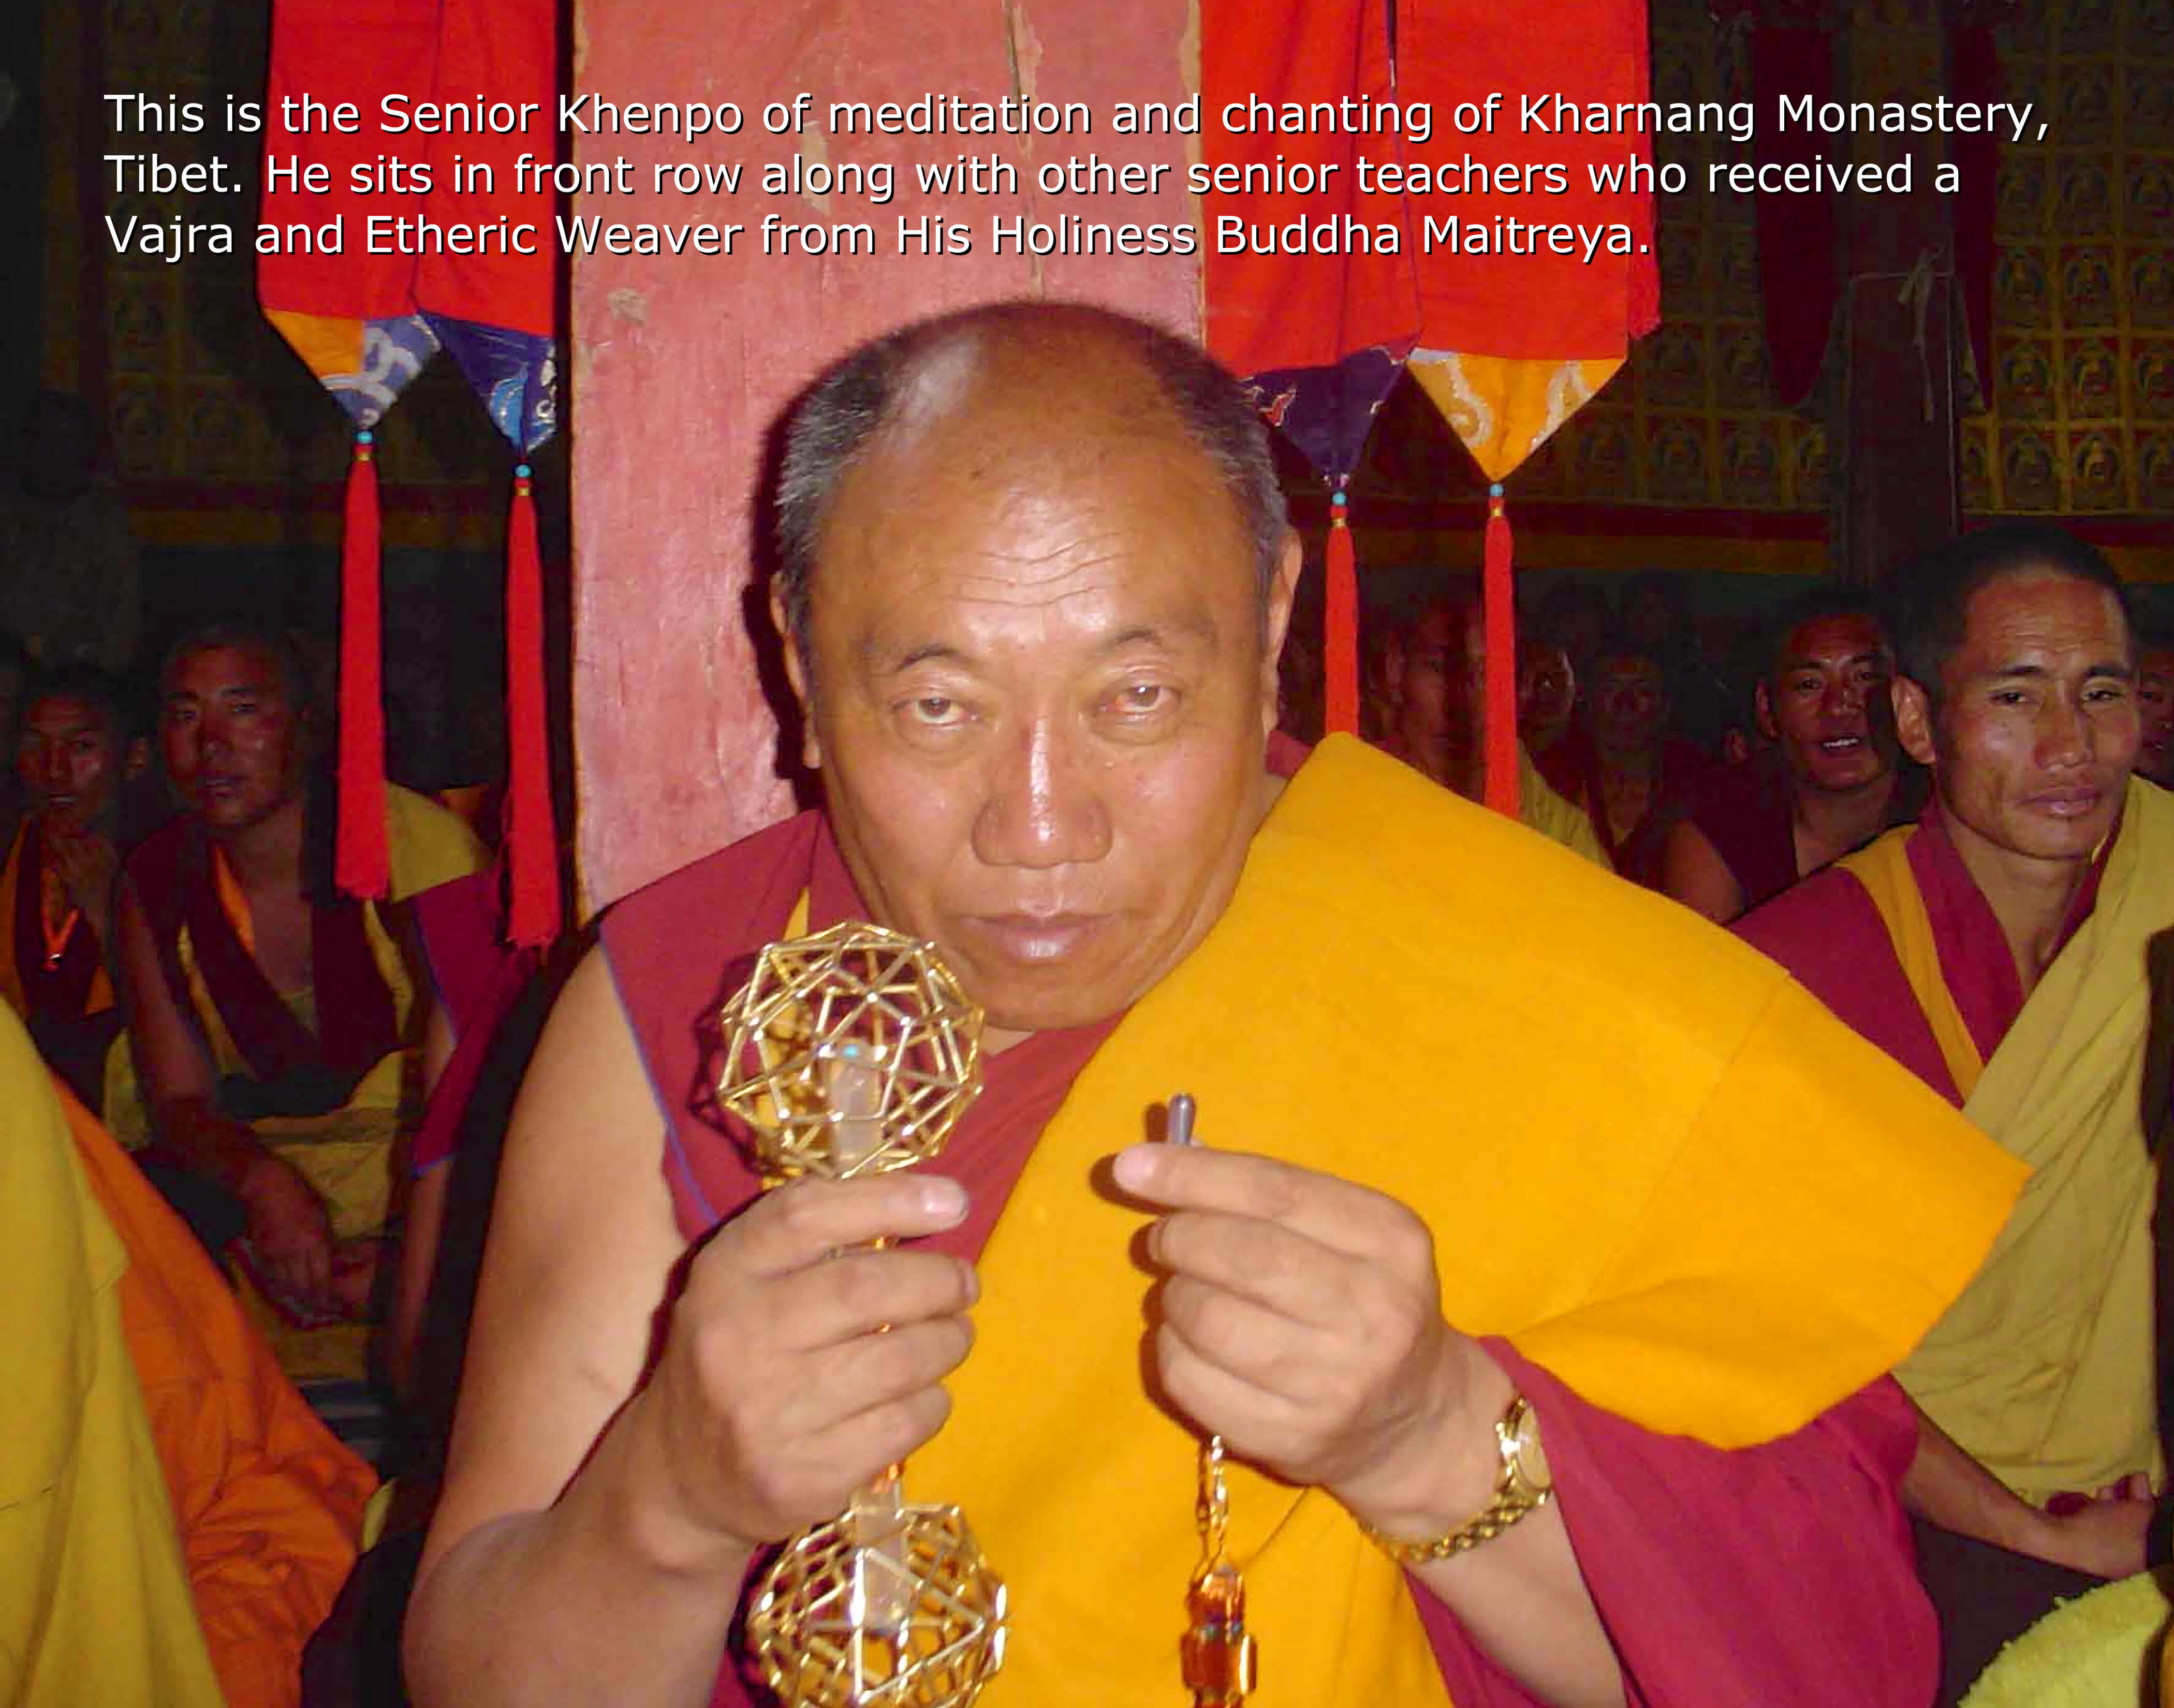 Buddha Maitreya and Khenpo of Kharnang